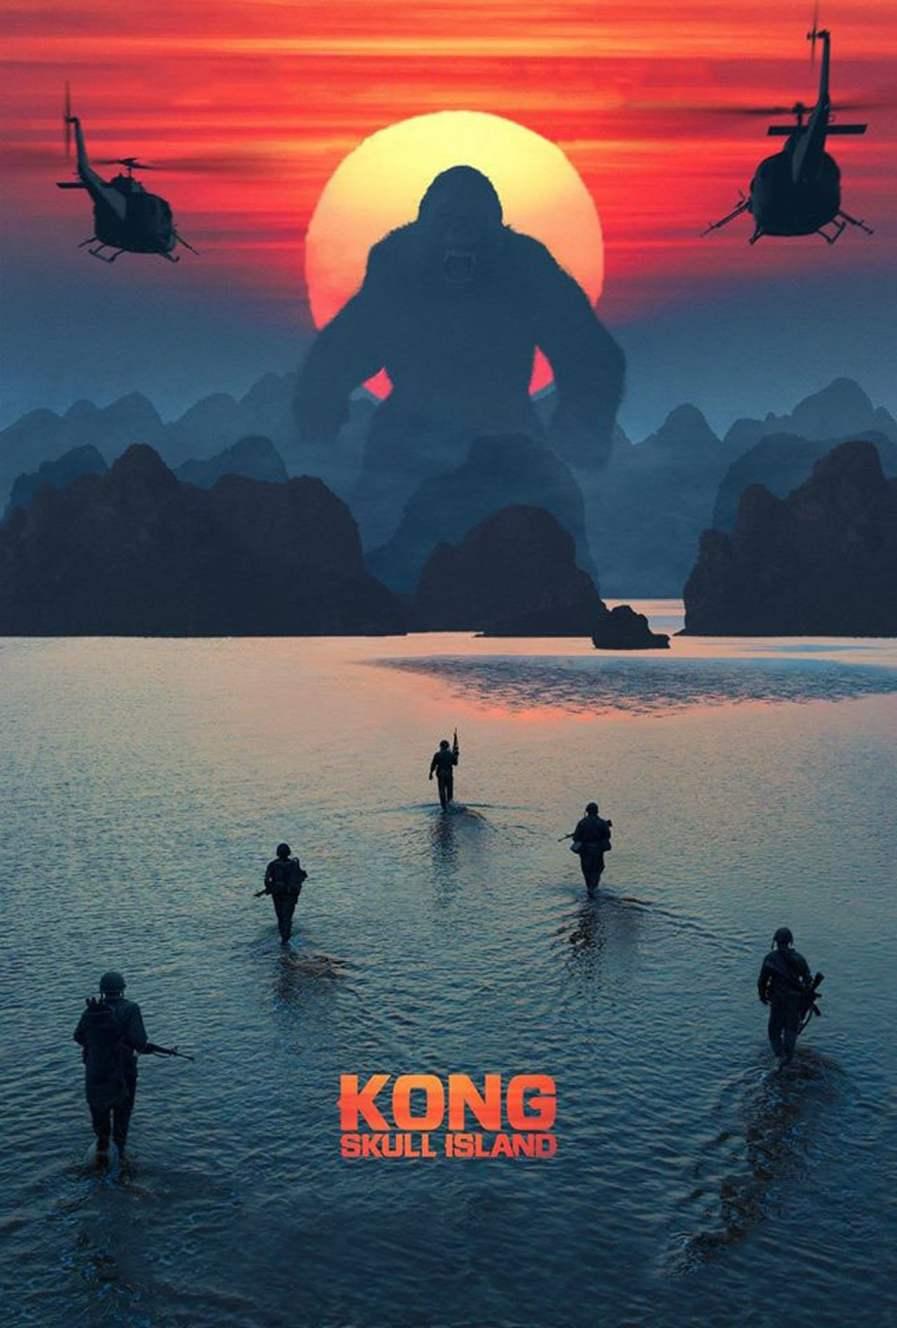 kong skull island full movie stream free